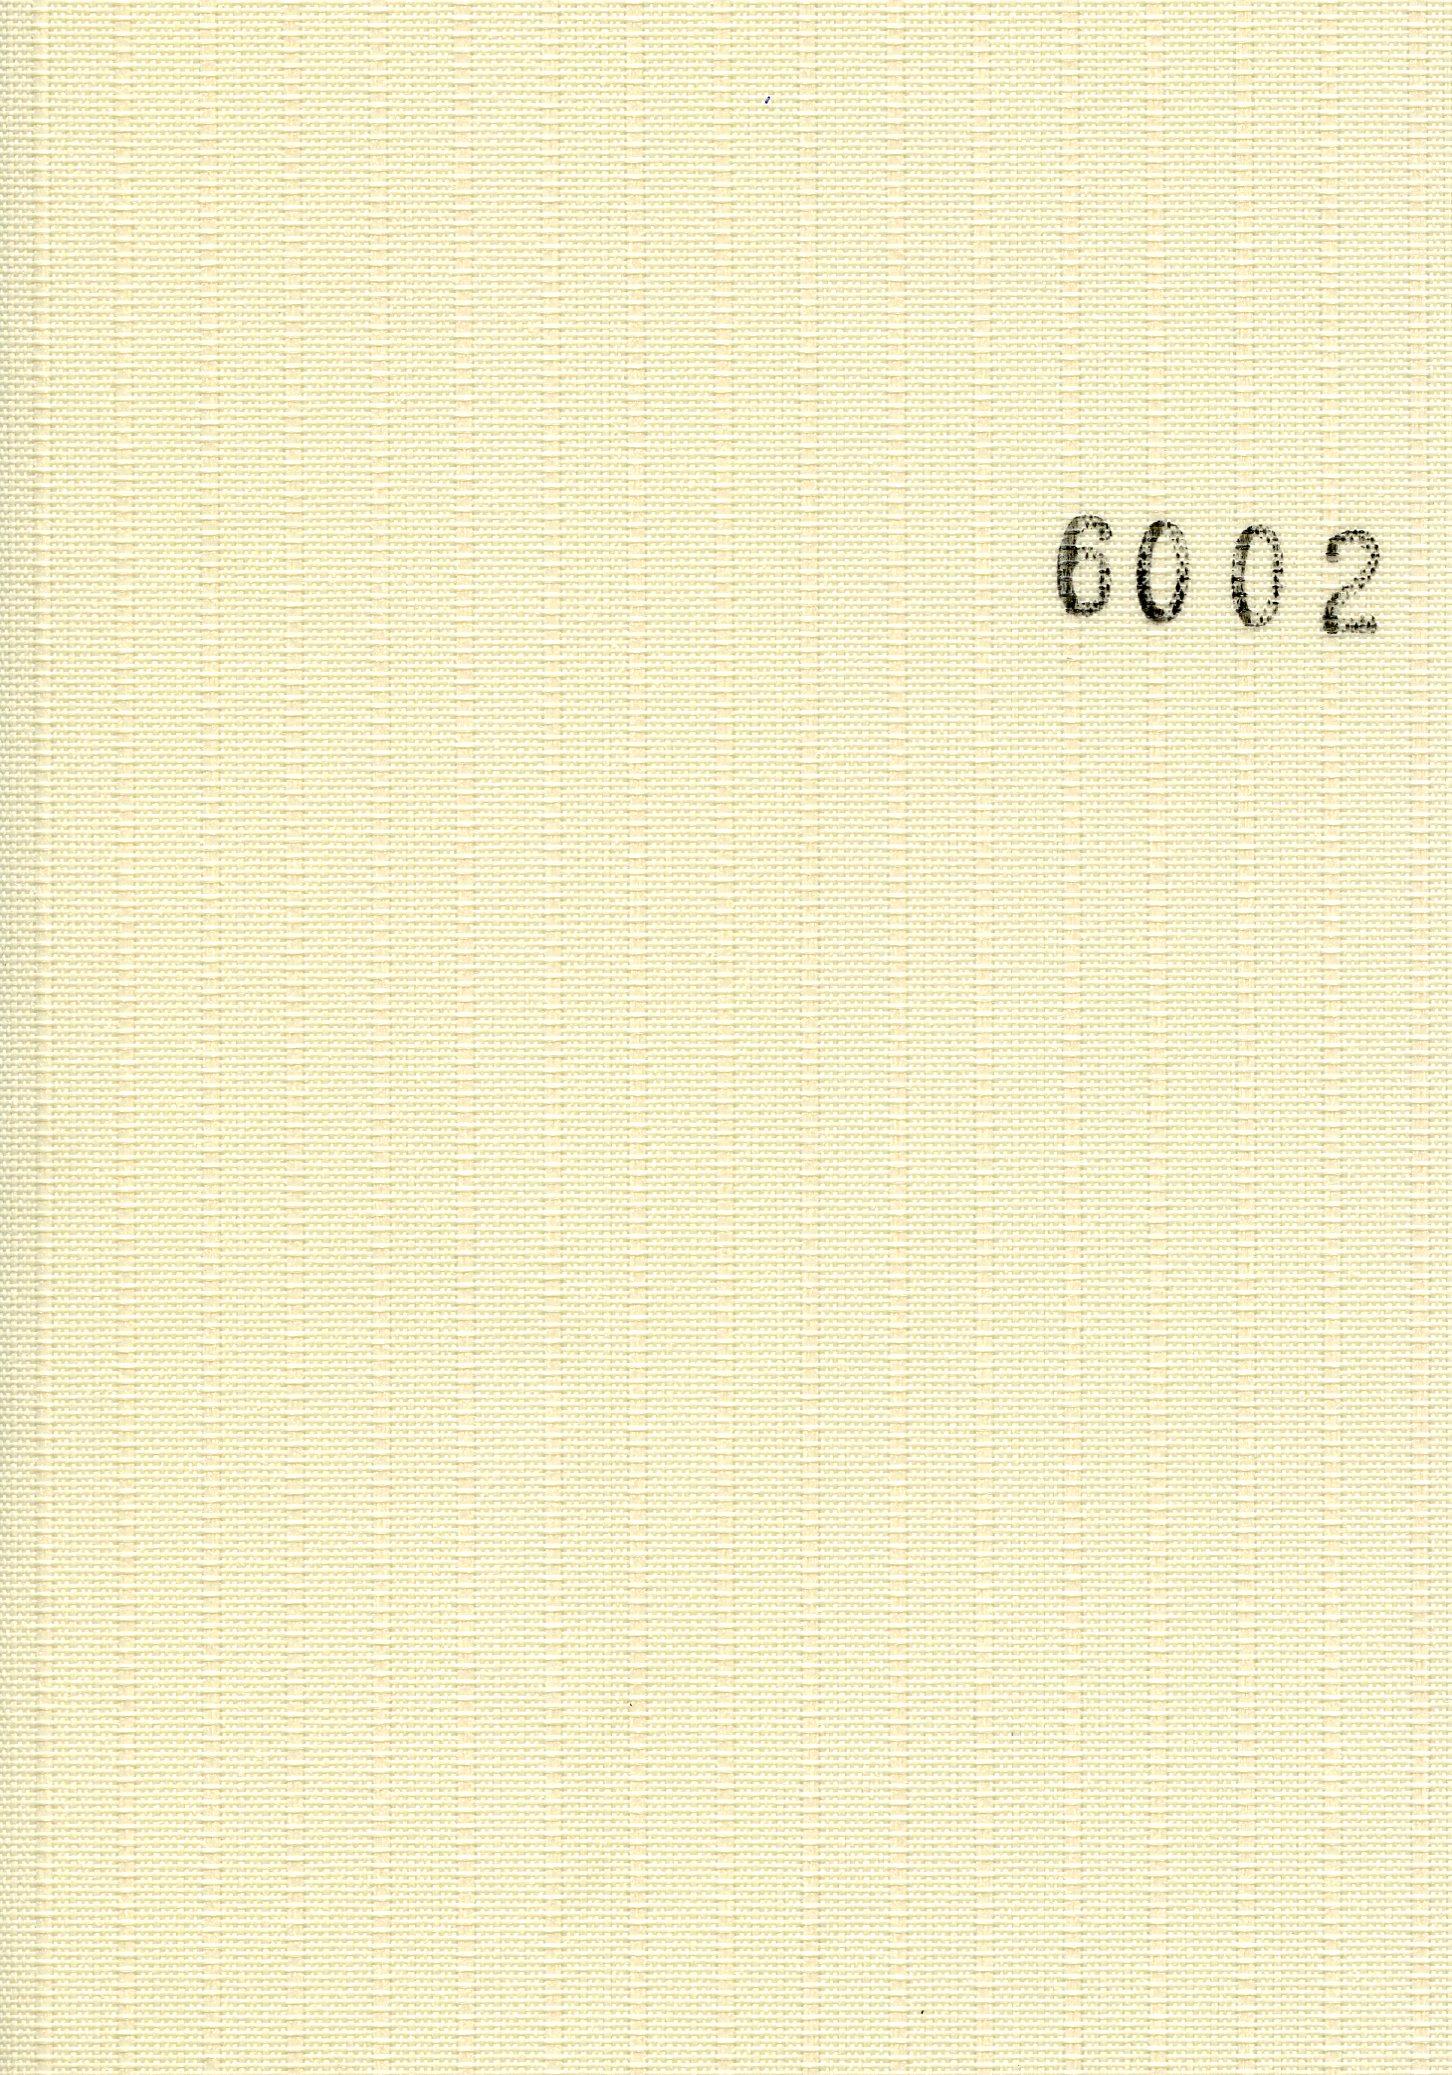 Line 6002